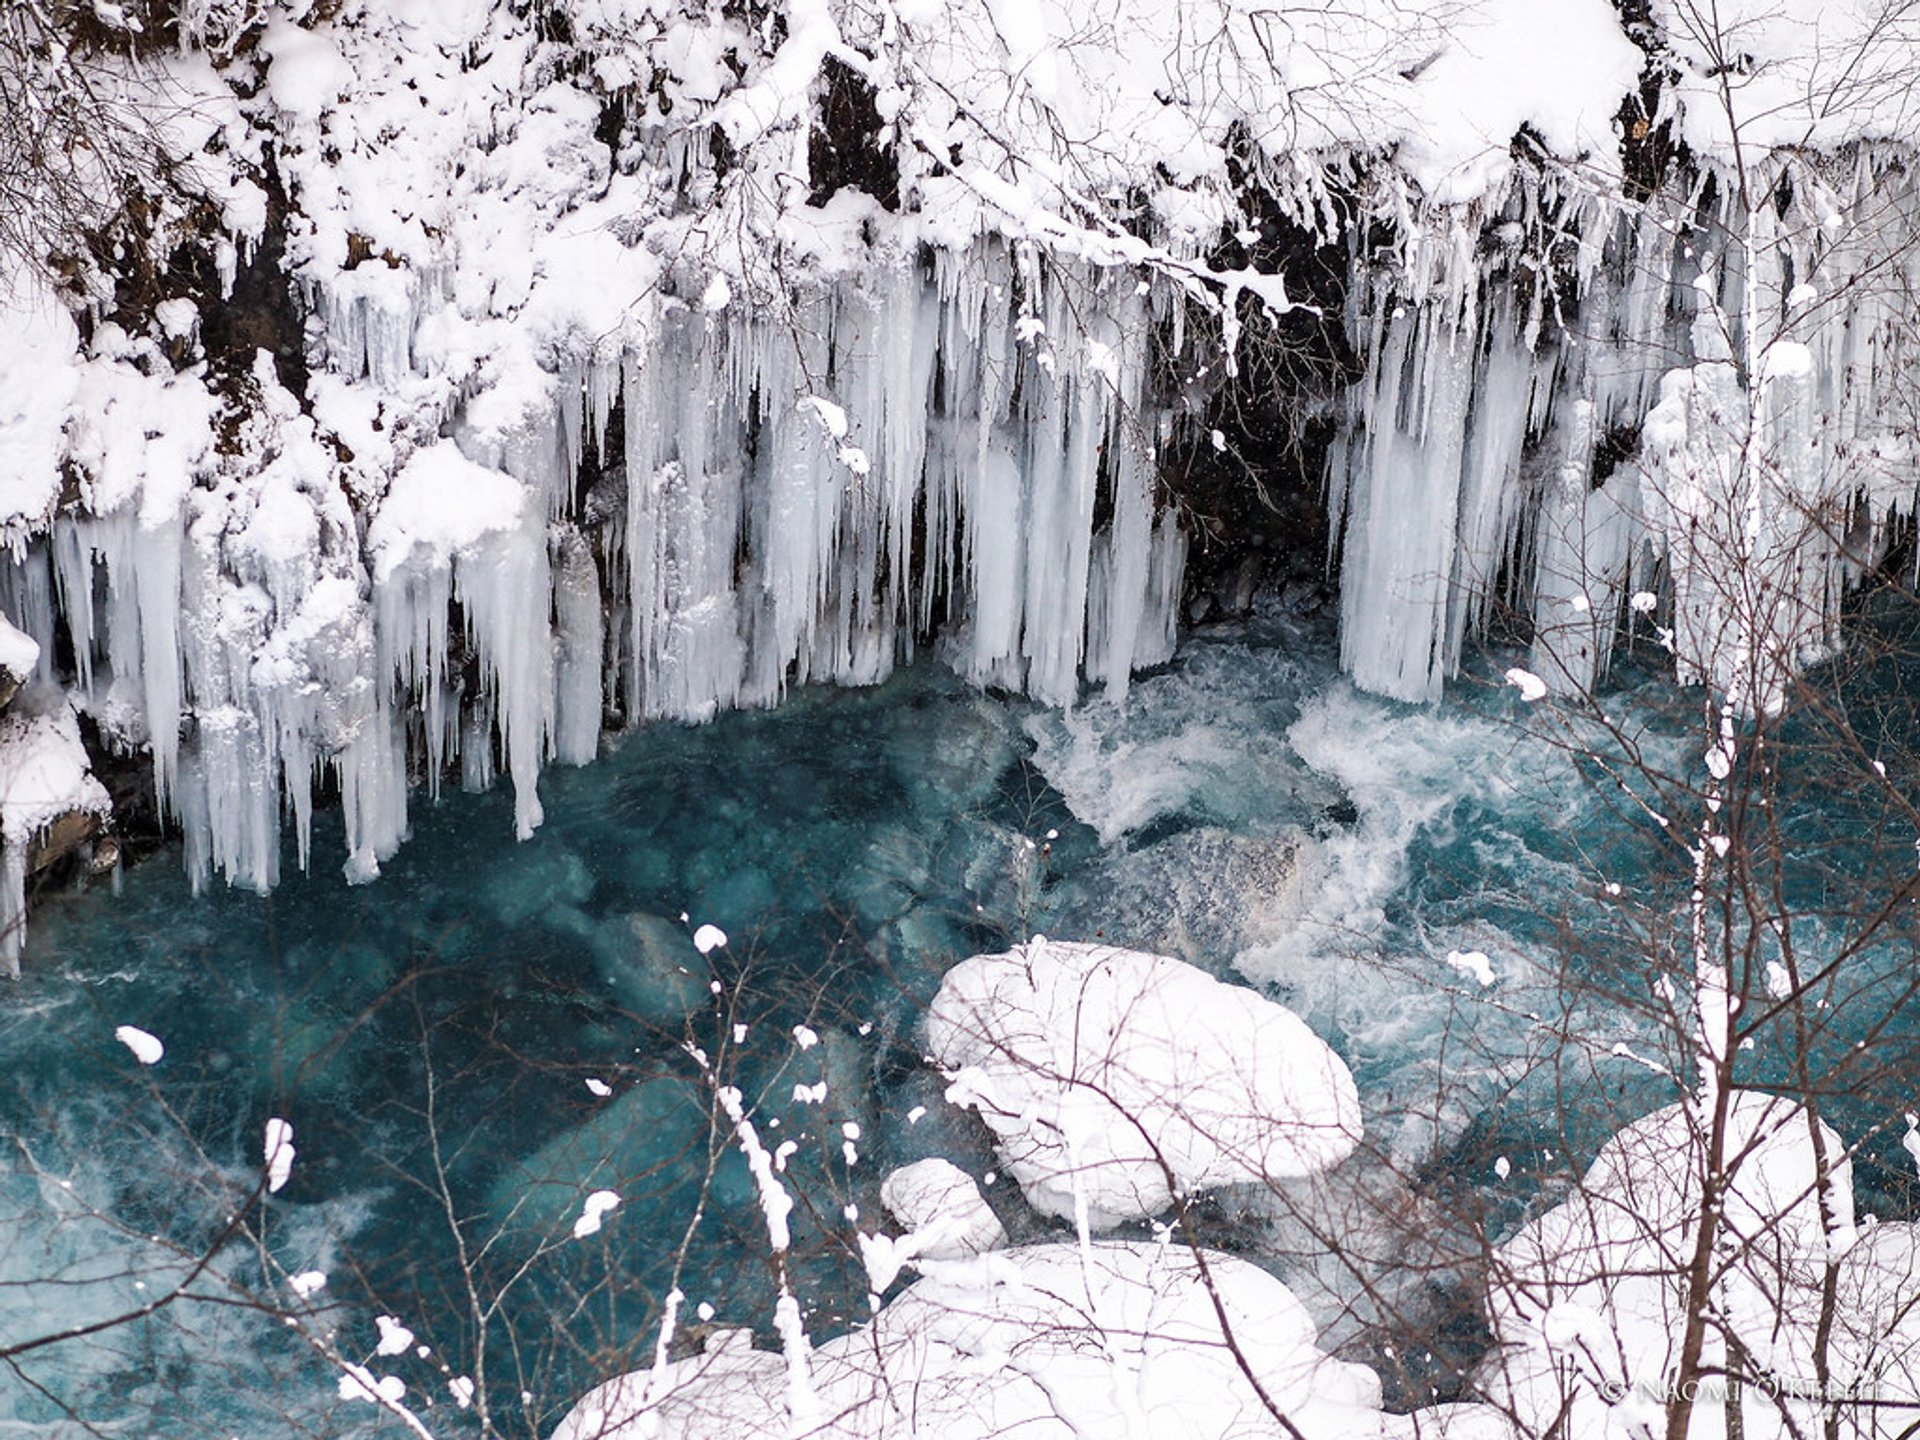 Blue River at Shirogane Onsen (Hot Spring), Biei, Hokkaido 2019